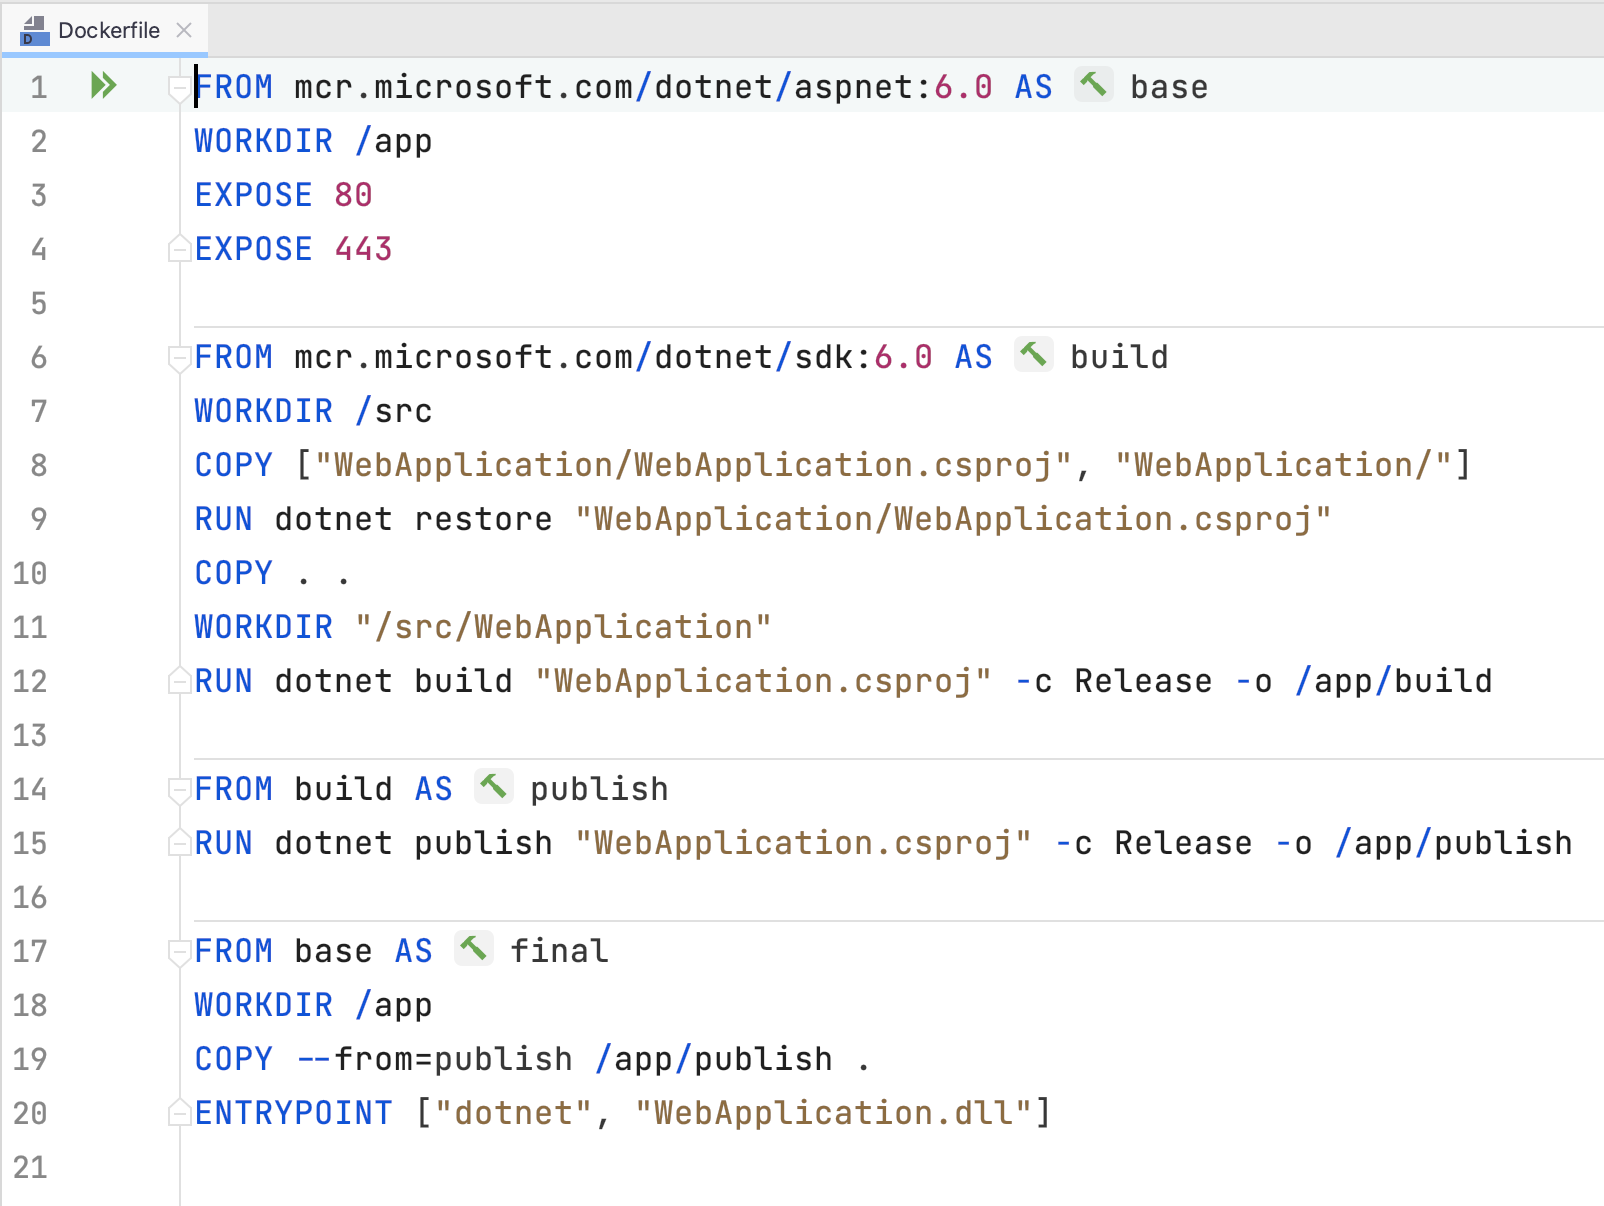 Dockerfile in editor window